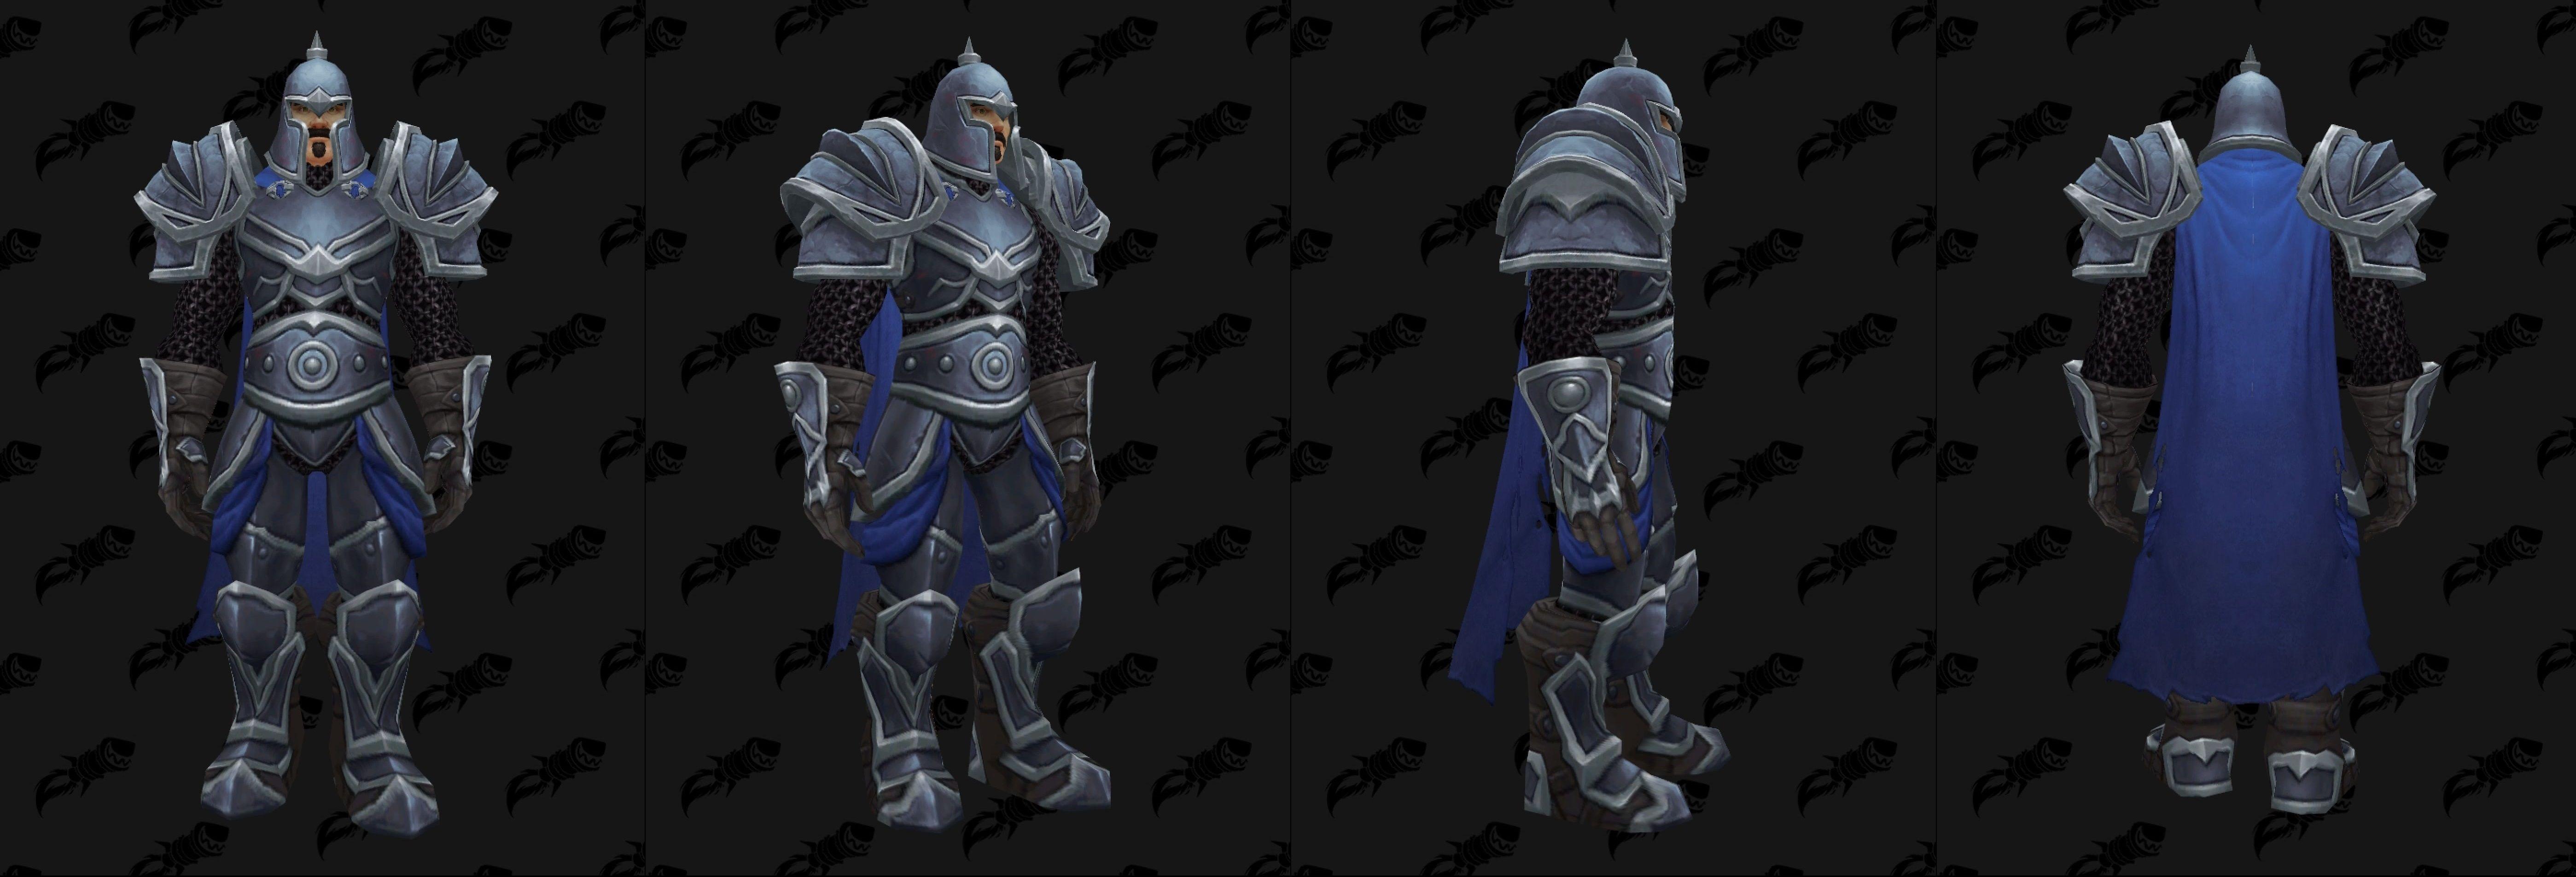 WoW Warfront Armor Human Set 1